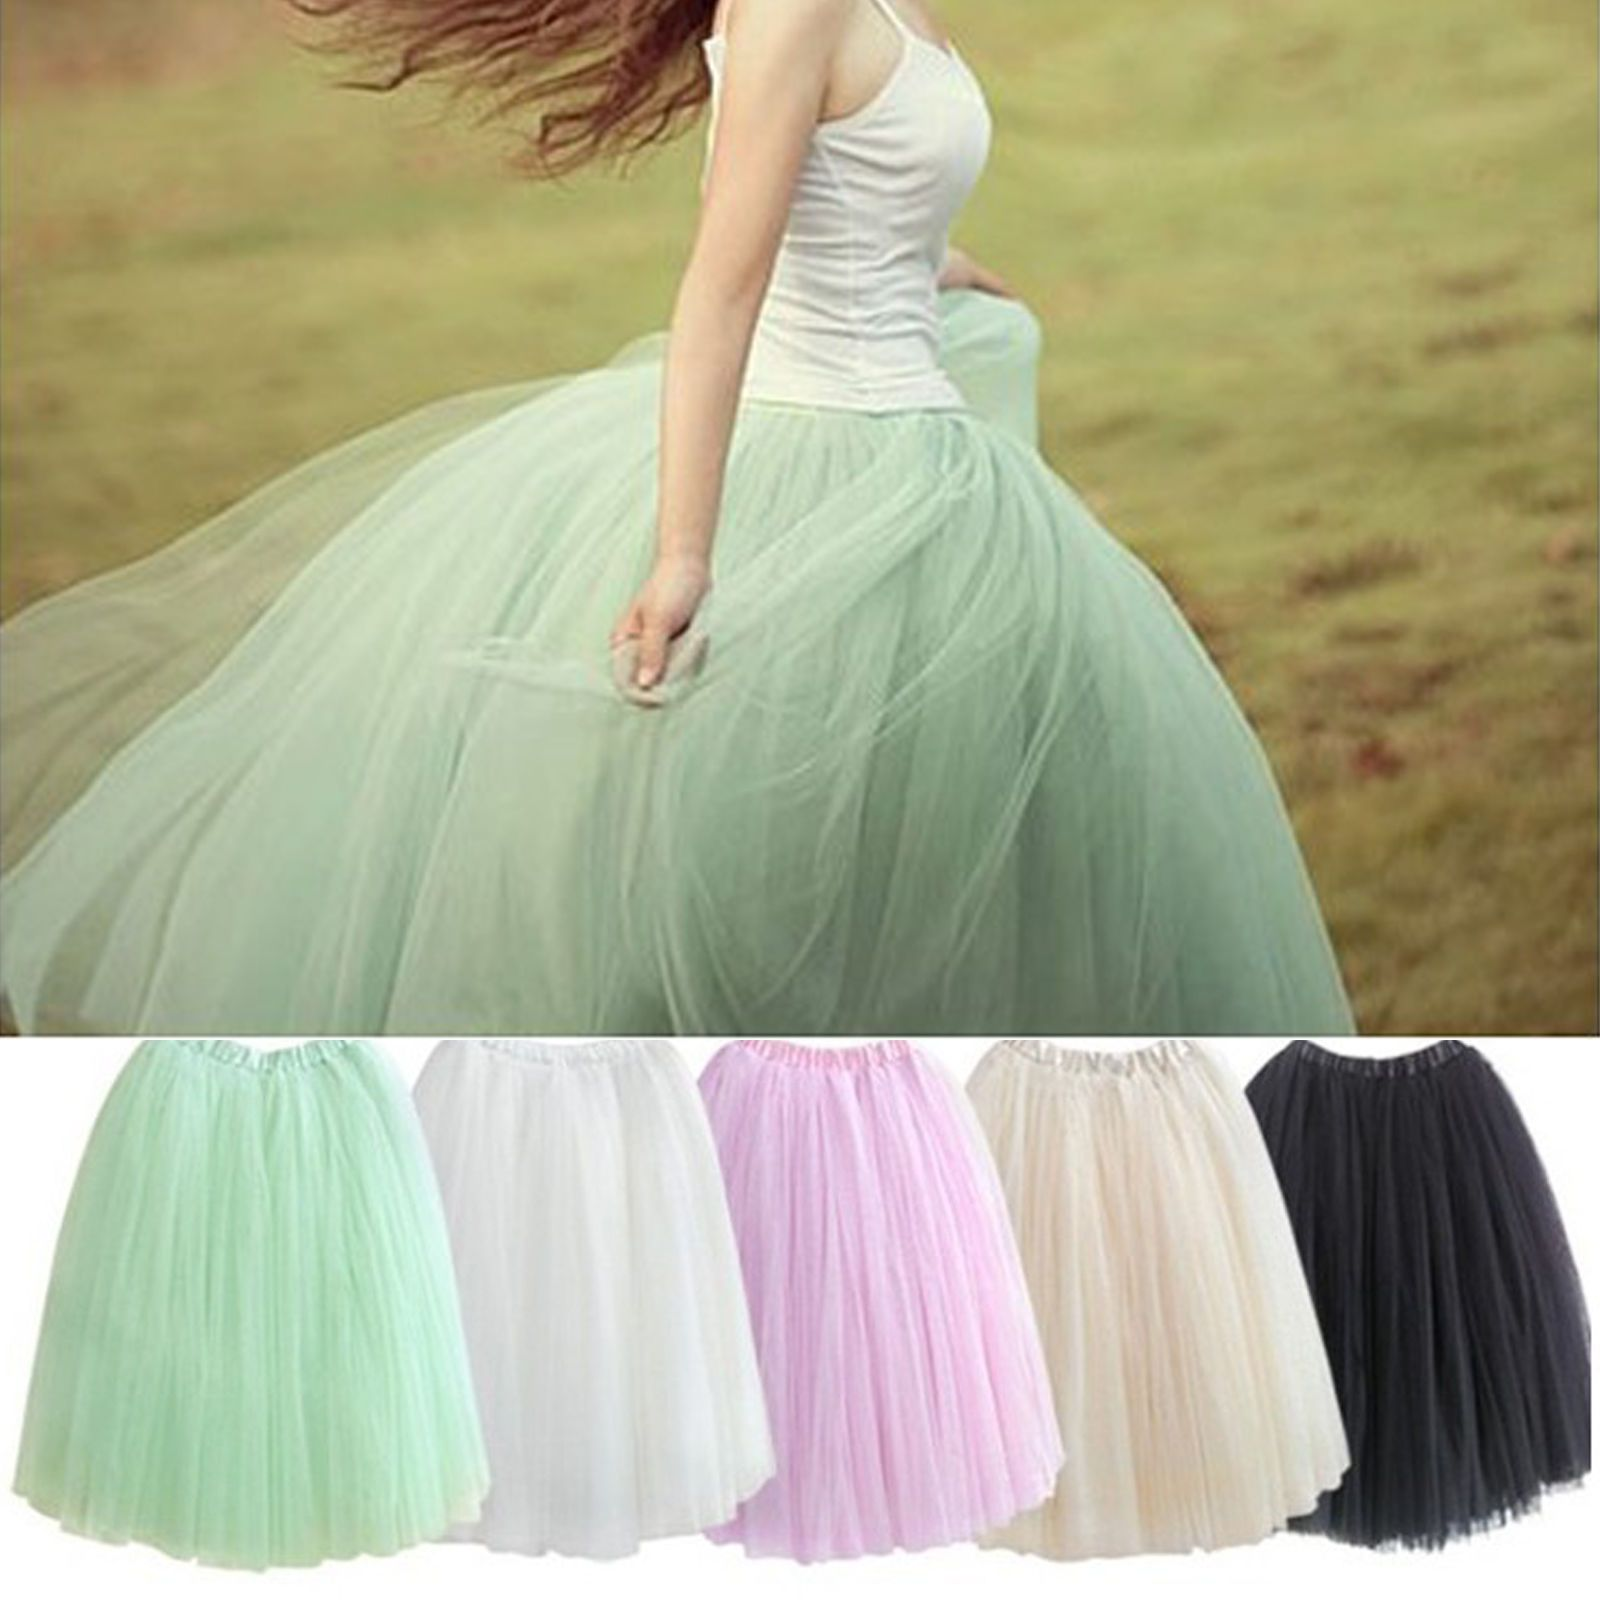 Petticoat 5 Lagen 5 lagig Tüllrock Prinzessin Kleid Rock Unterrock   eBay